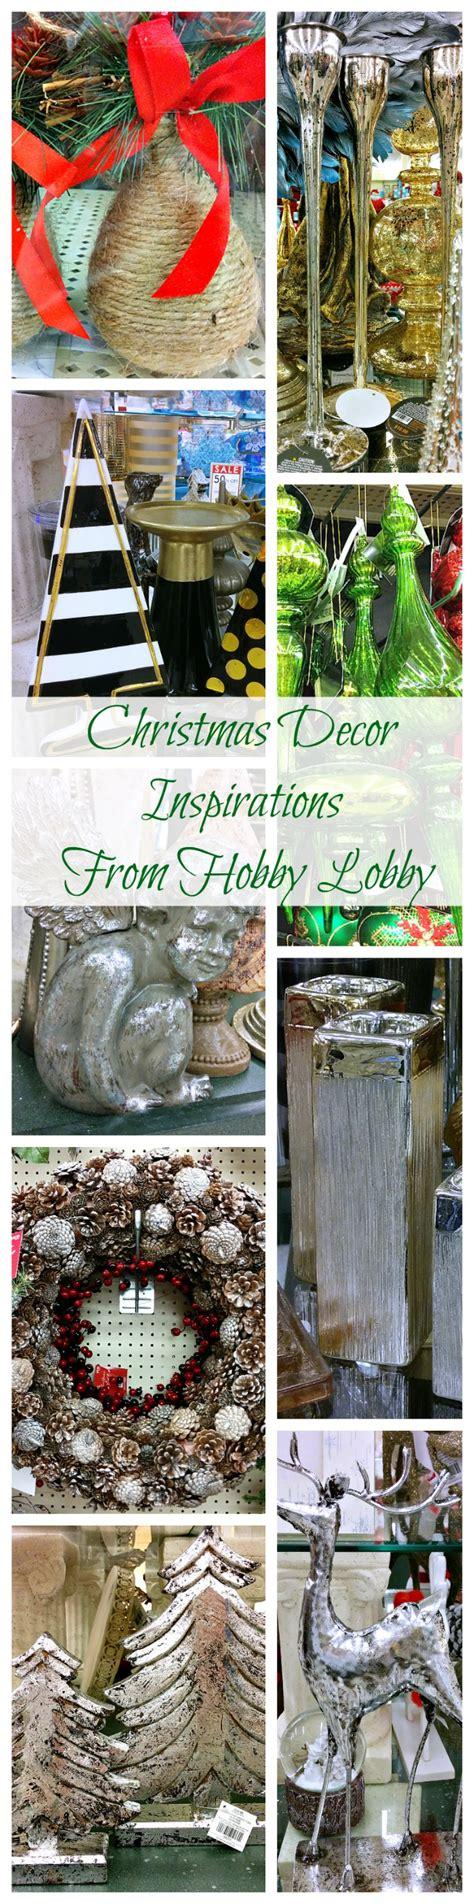 hobby lobby outdoor christmas decorations decor ideas inspirations from hobby lobby do it yourself ideas